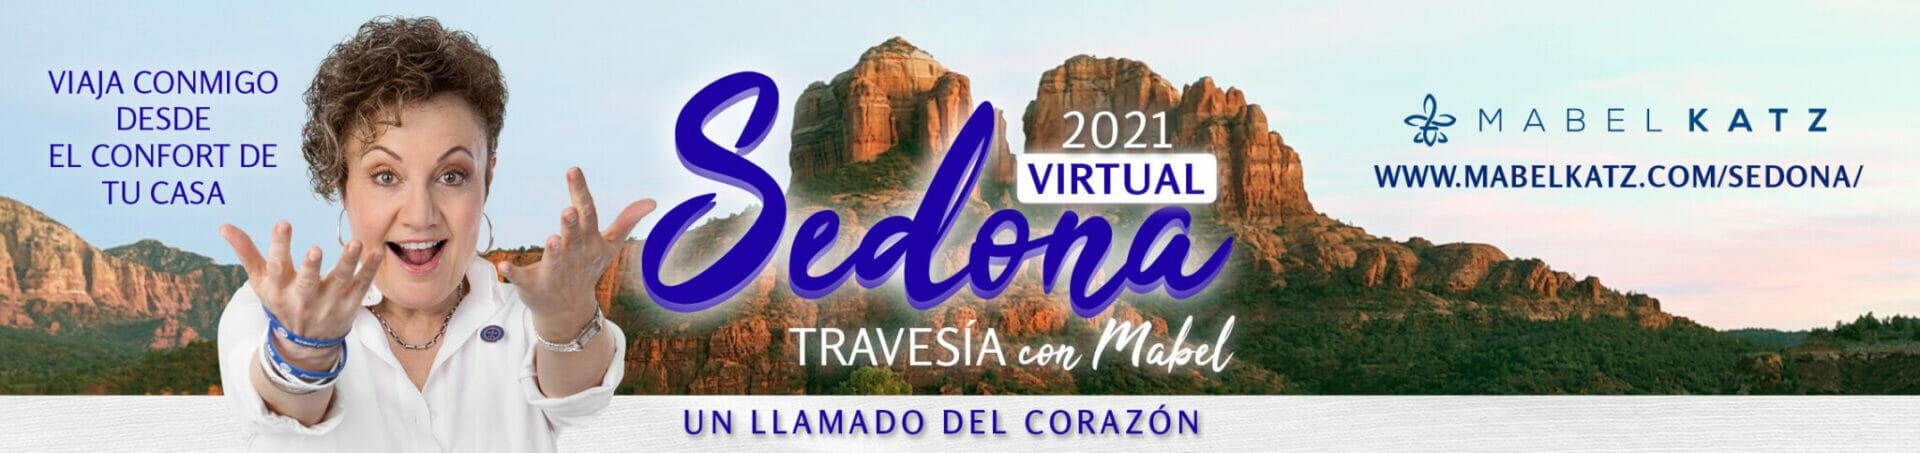 sedona-virtual-banner